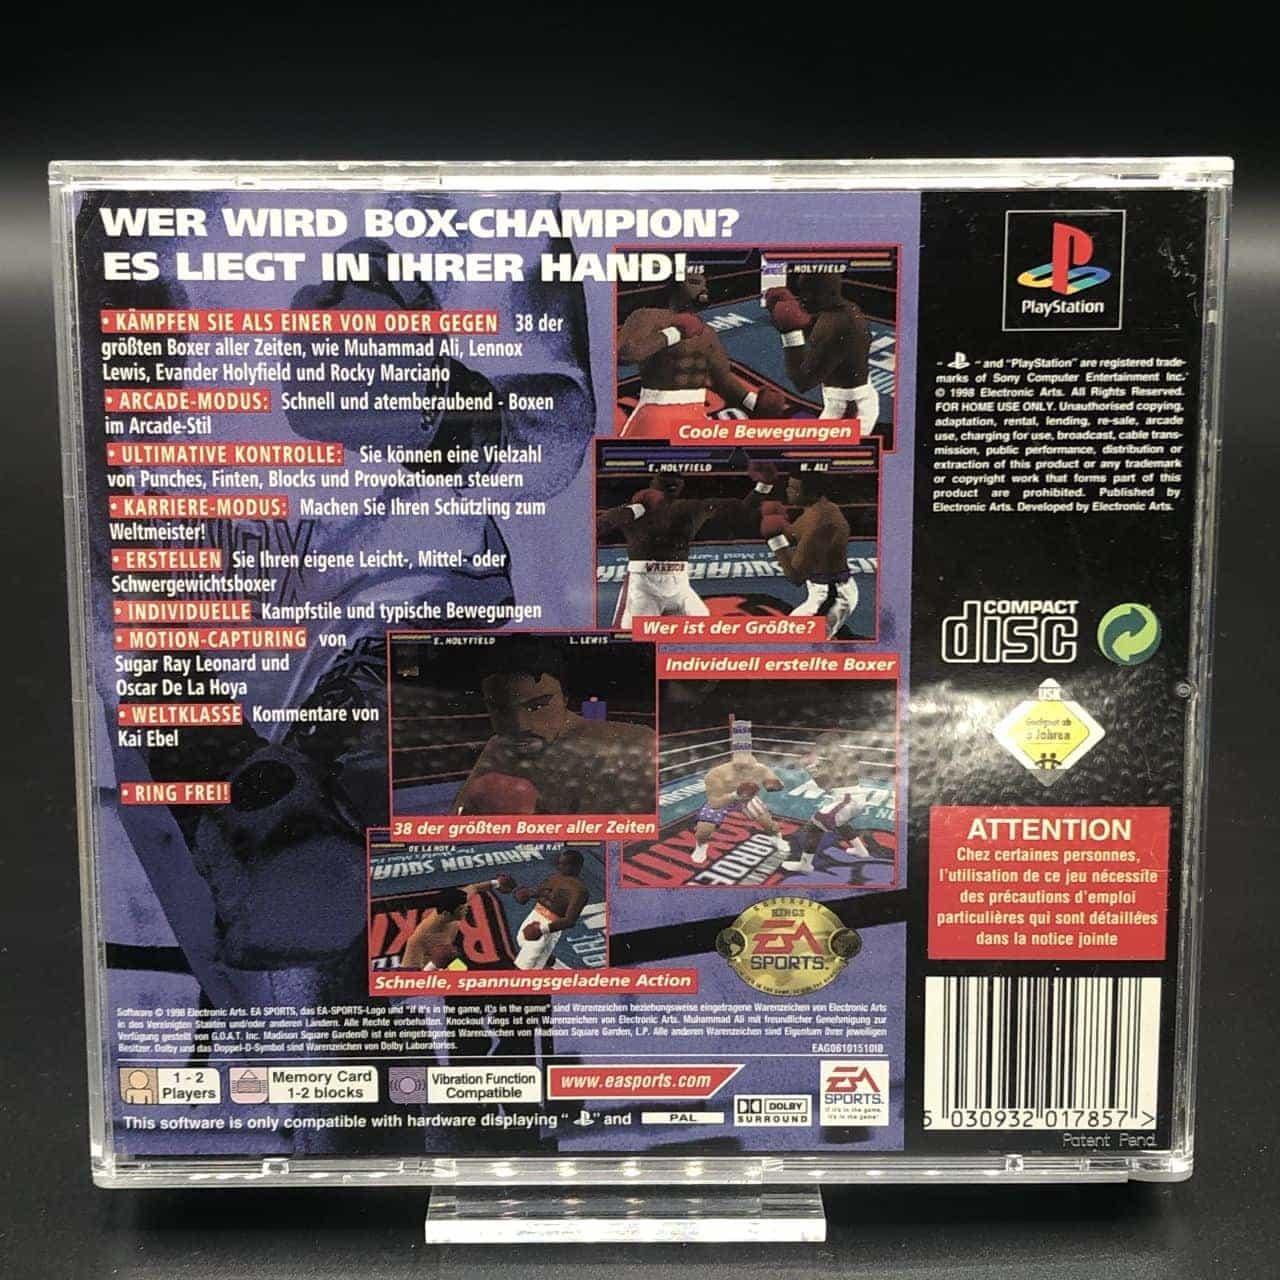 PS1 Box Champions (Komplett) (Sehr gut) Sony PlayStation 1